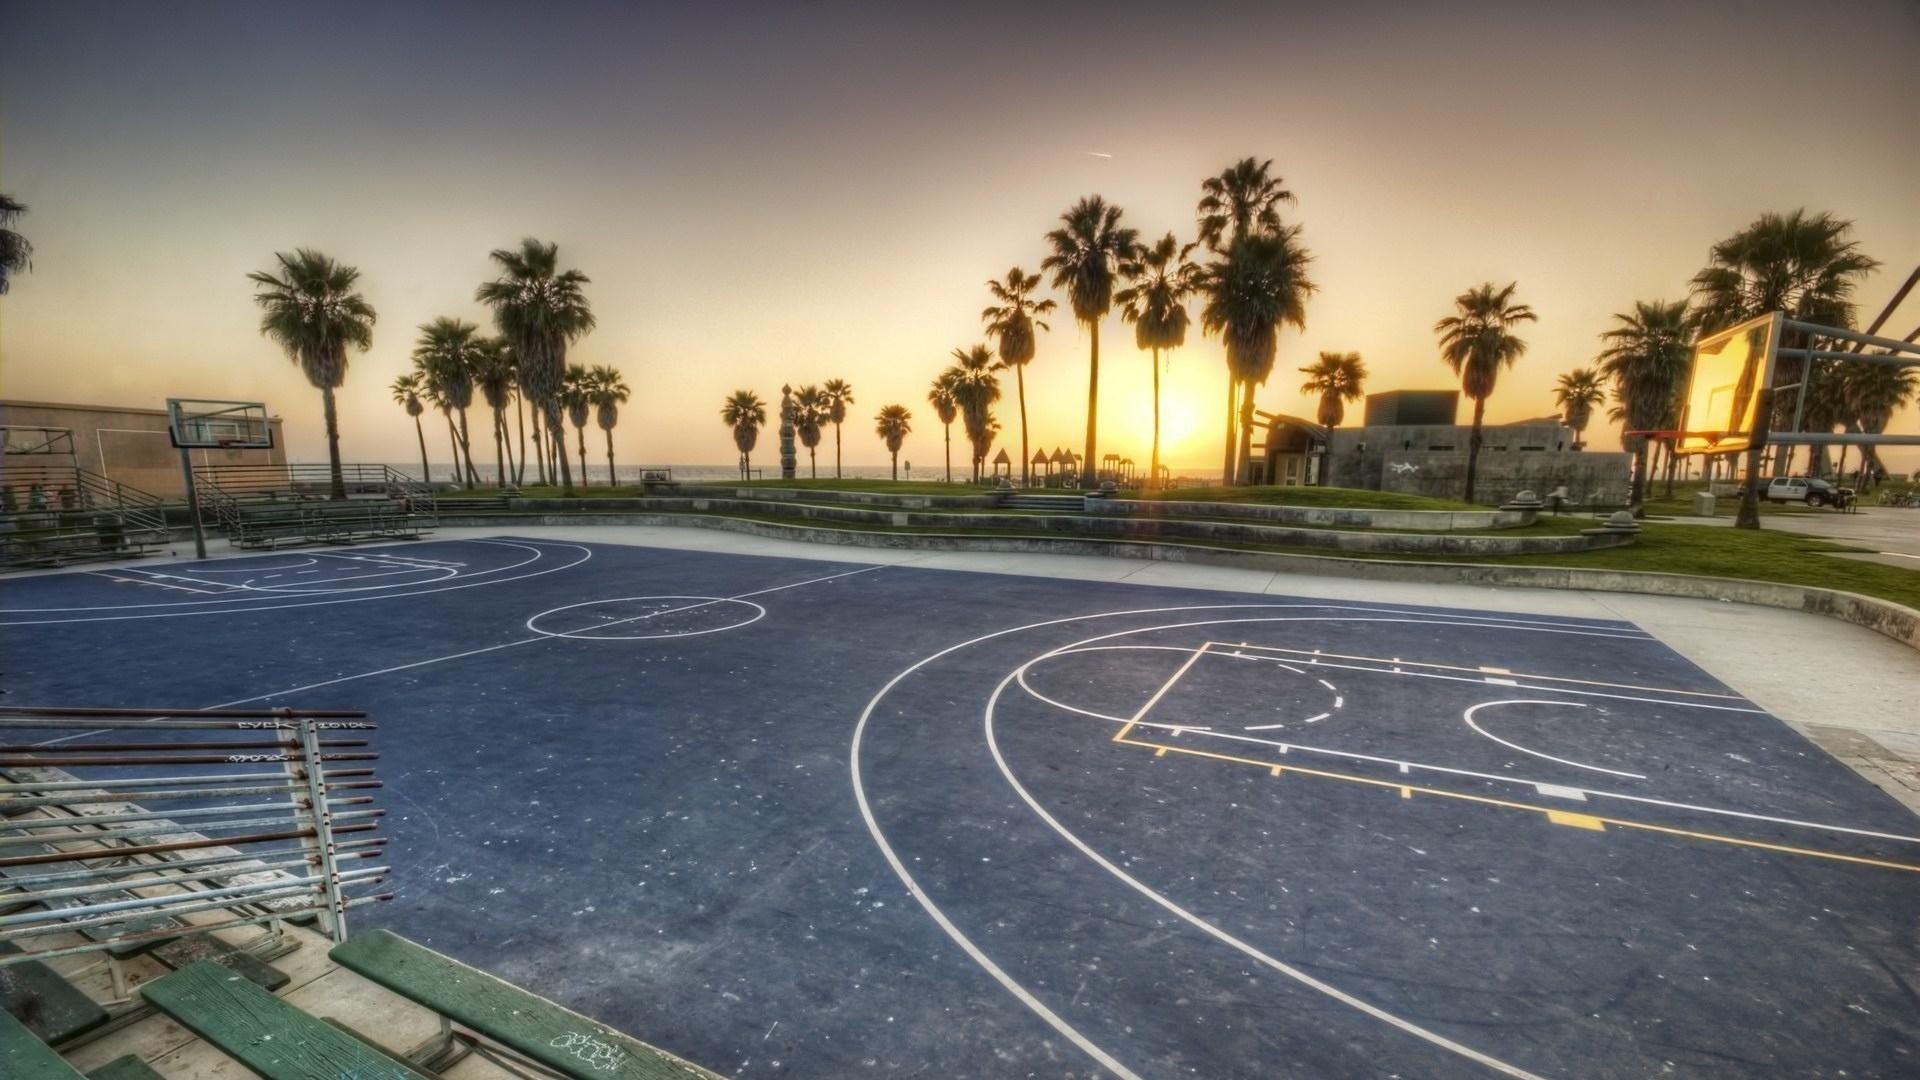 los angeles california sunset stadium sports usa Full HD 1080p HD 1920x1080